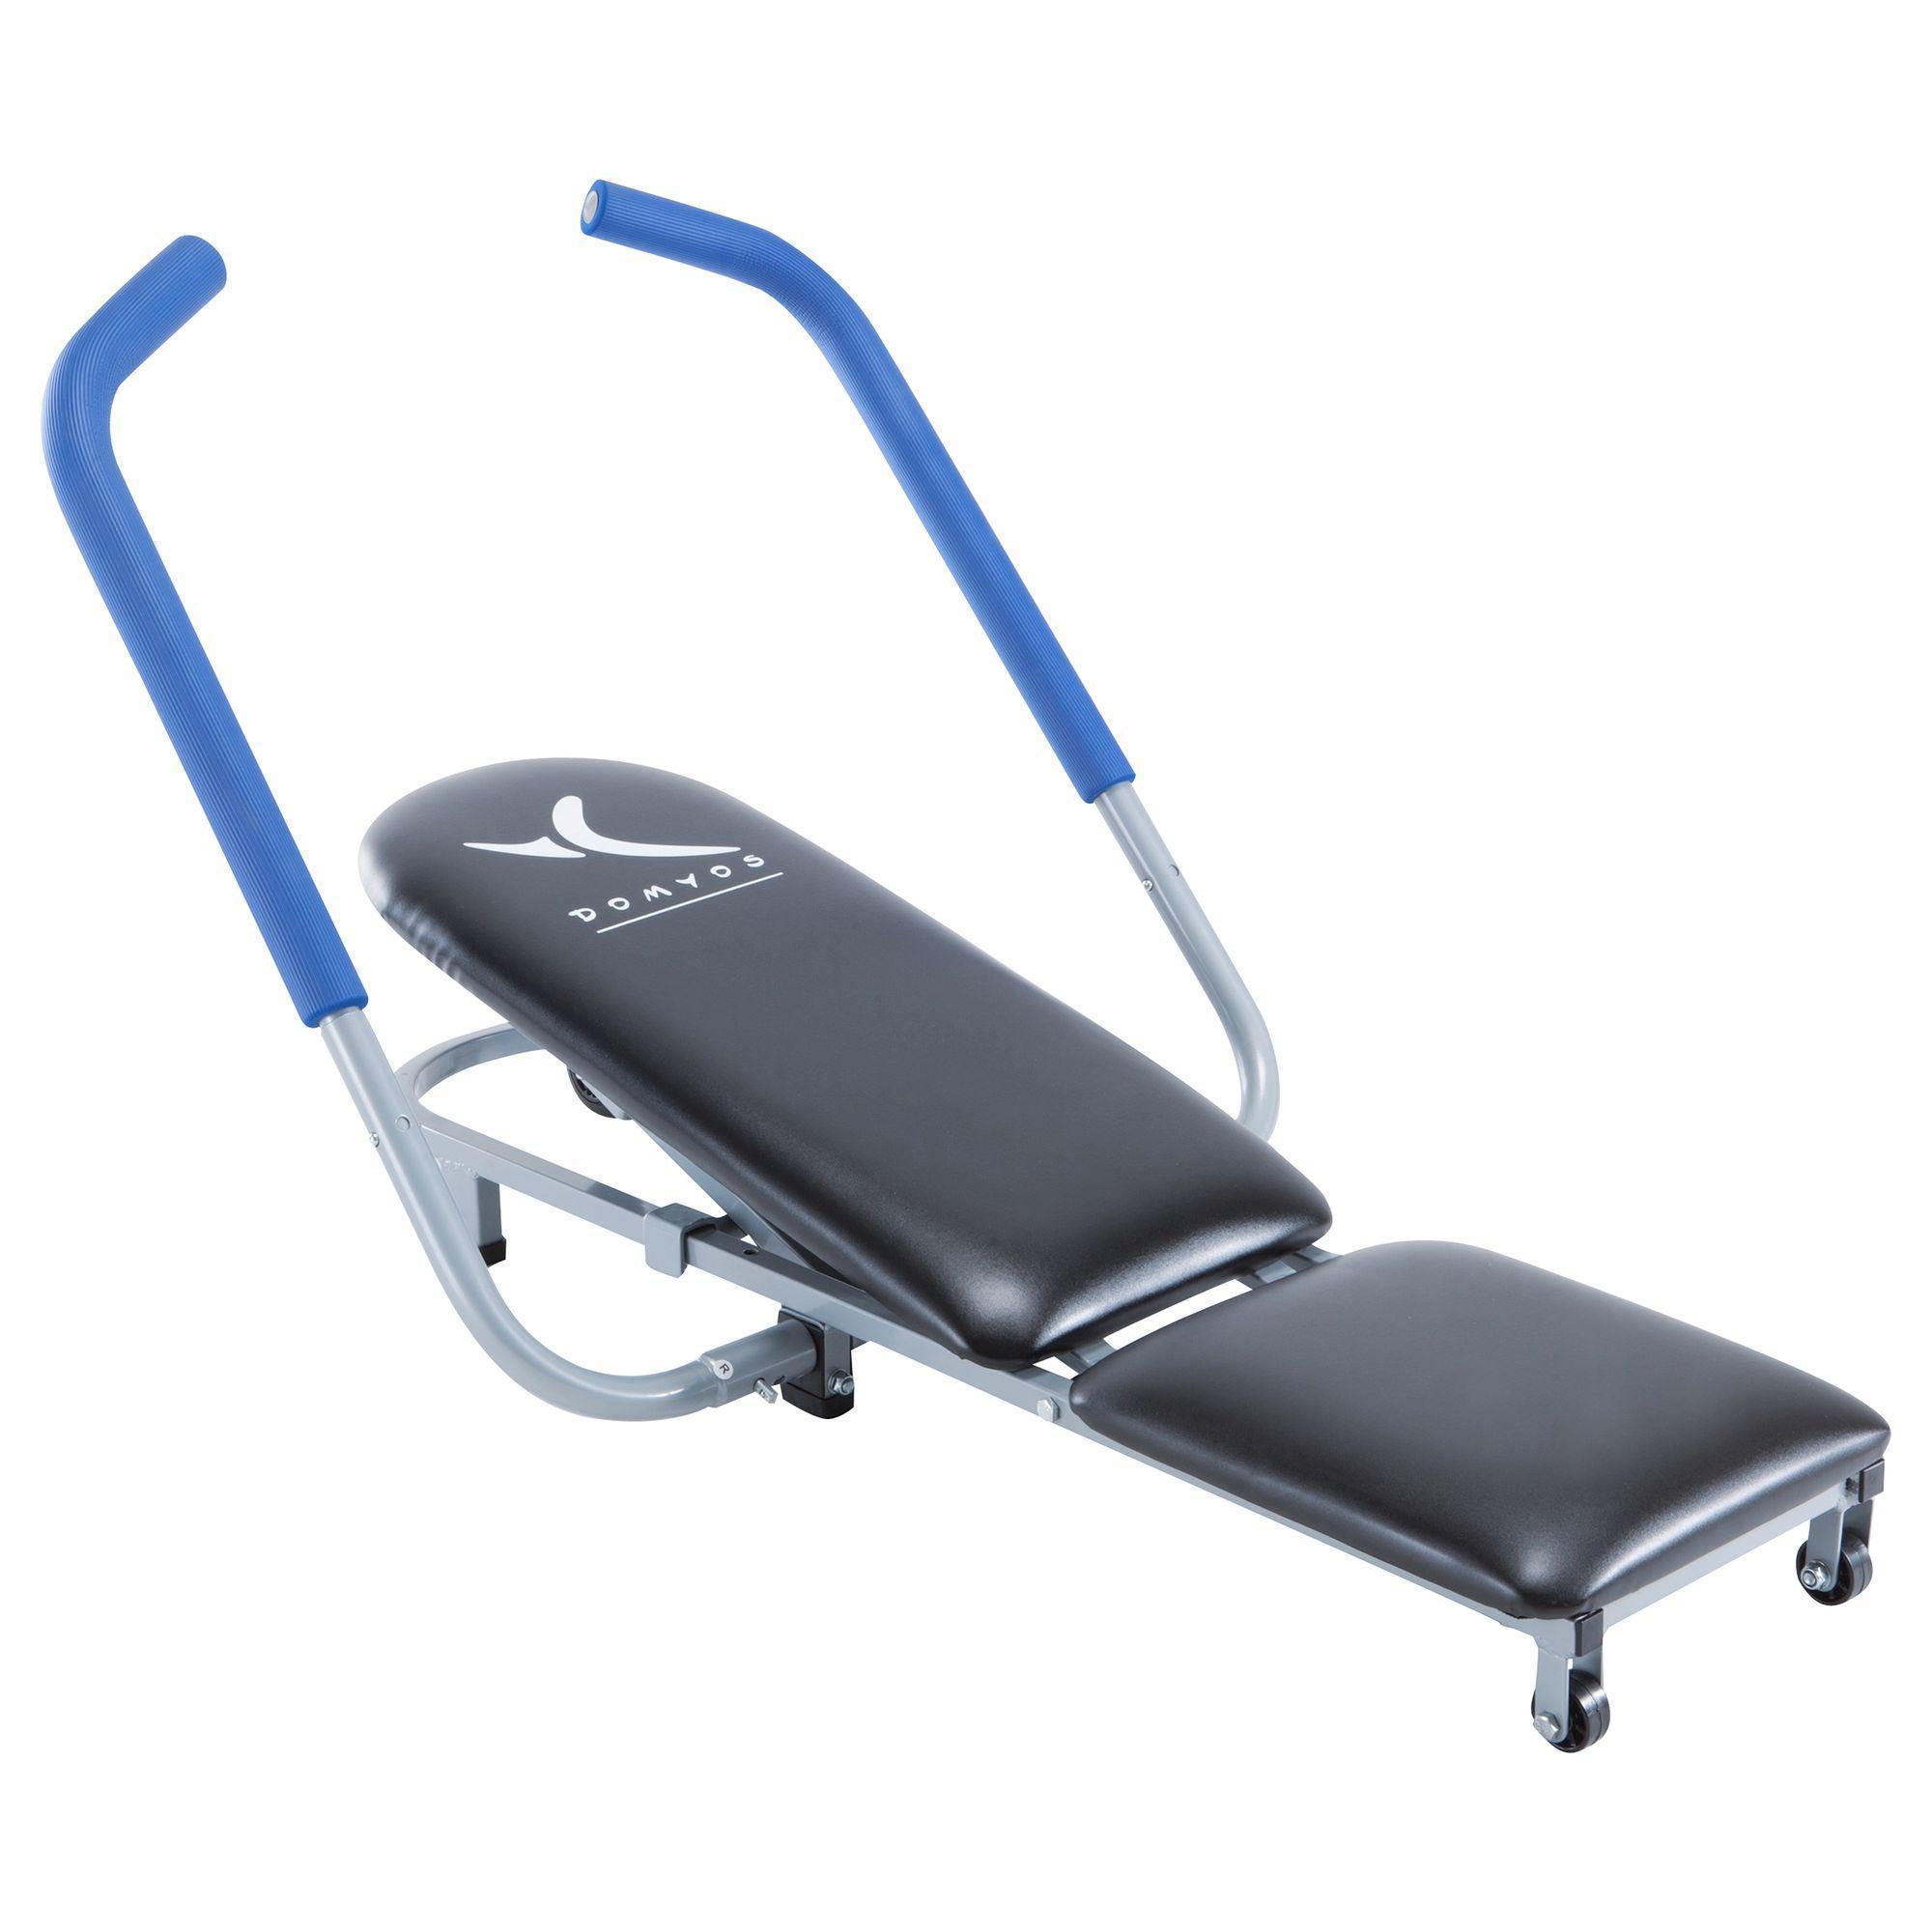 Appareil a abdominaux guide fitness ab 350 domyos by decathlon - Banc abdominaux exercices ...